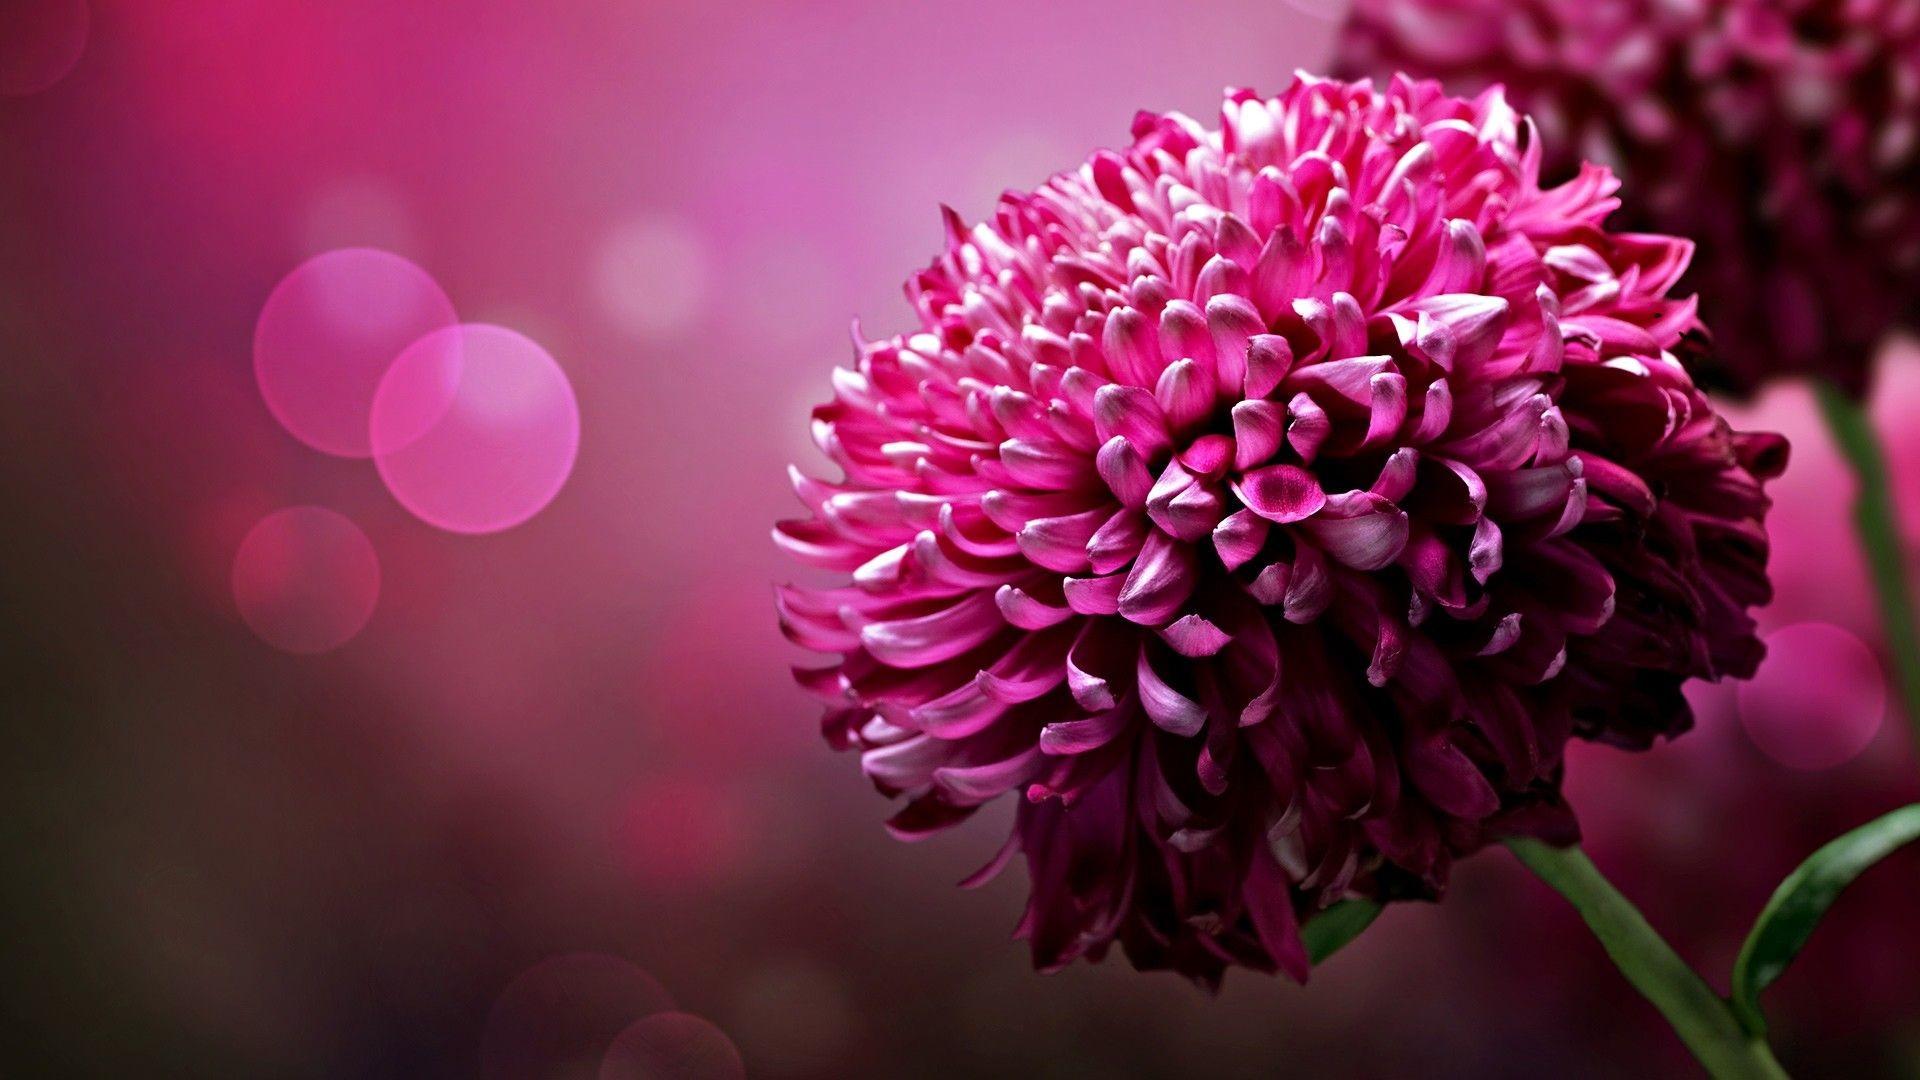 Flower Computer Wallpaper Backgrounds 72 Images